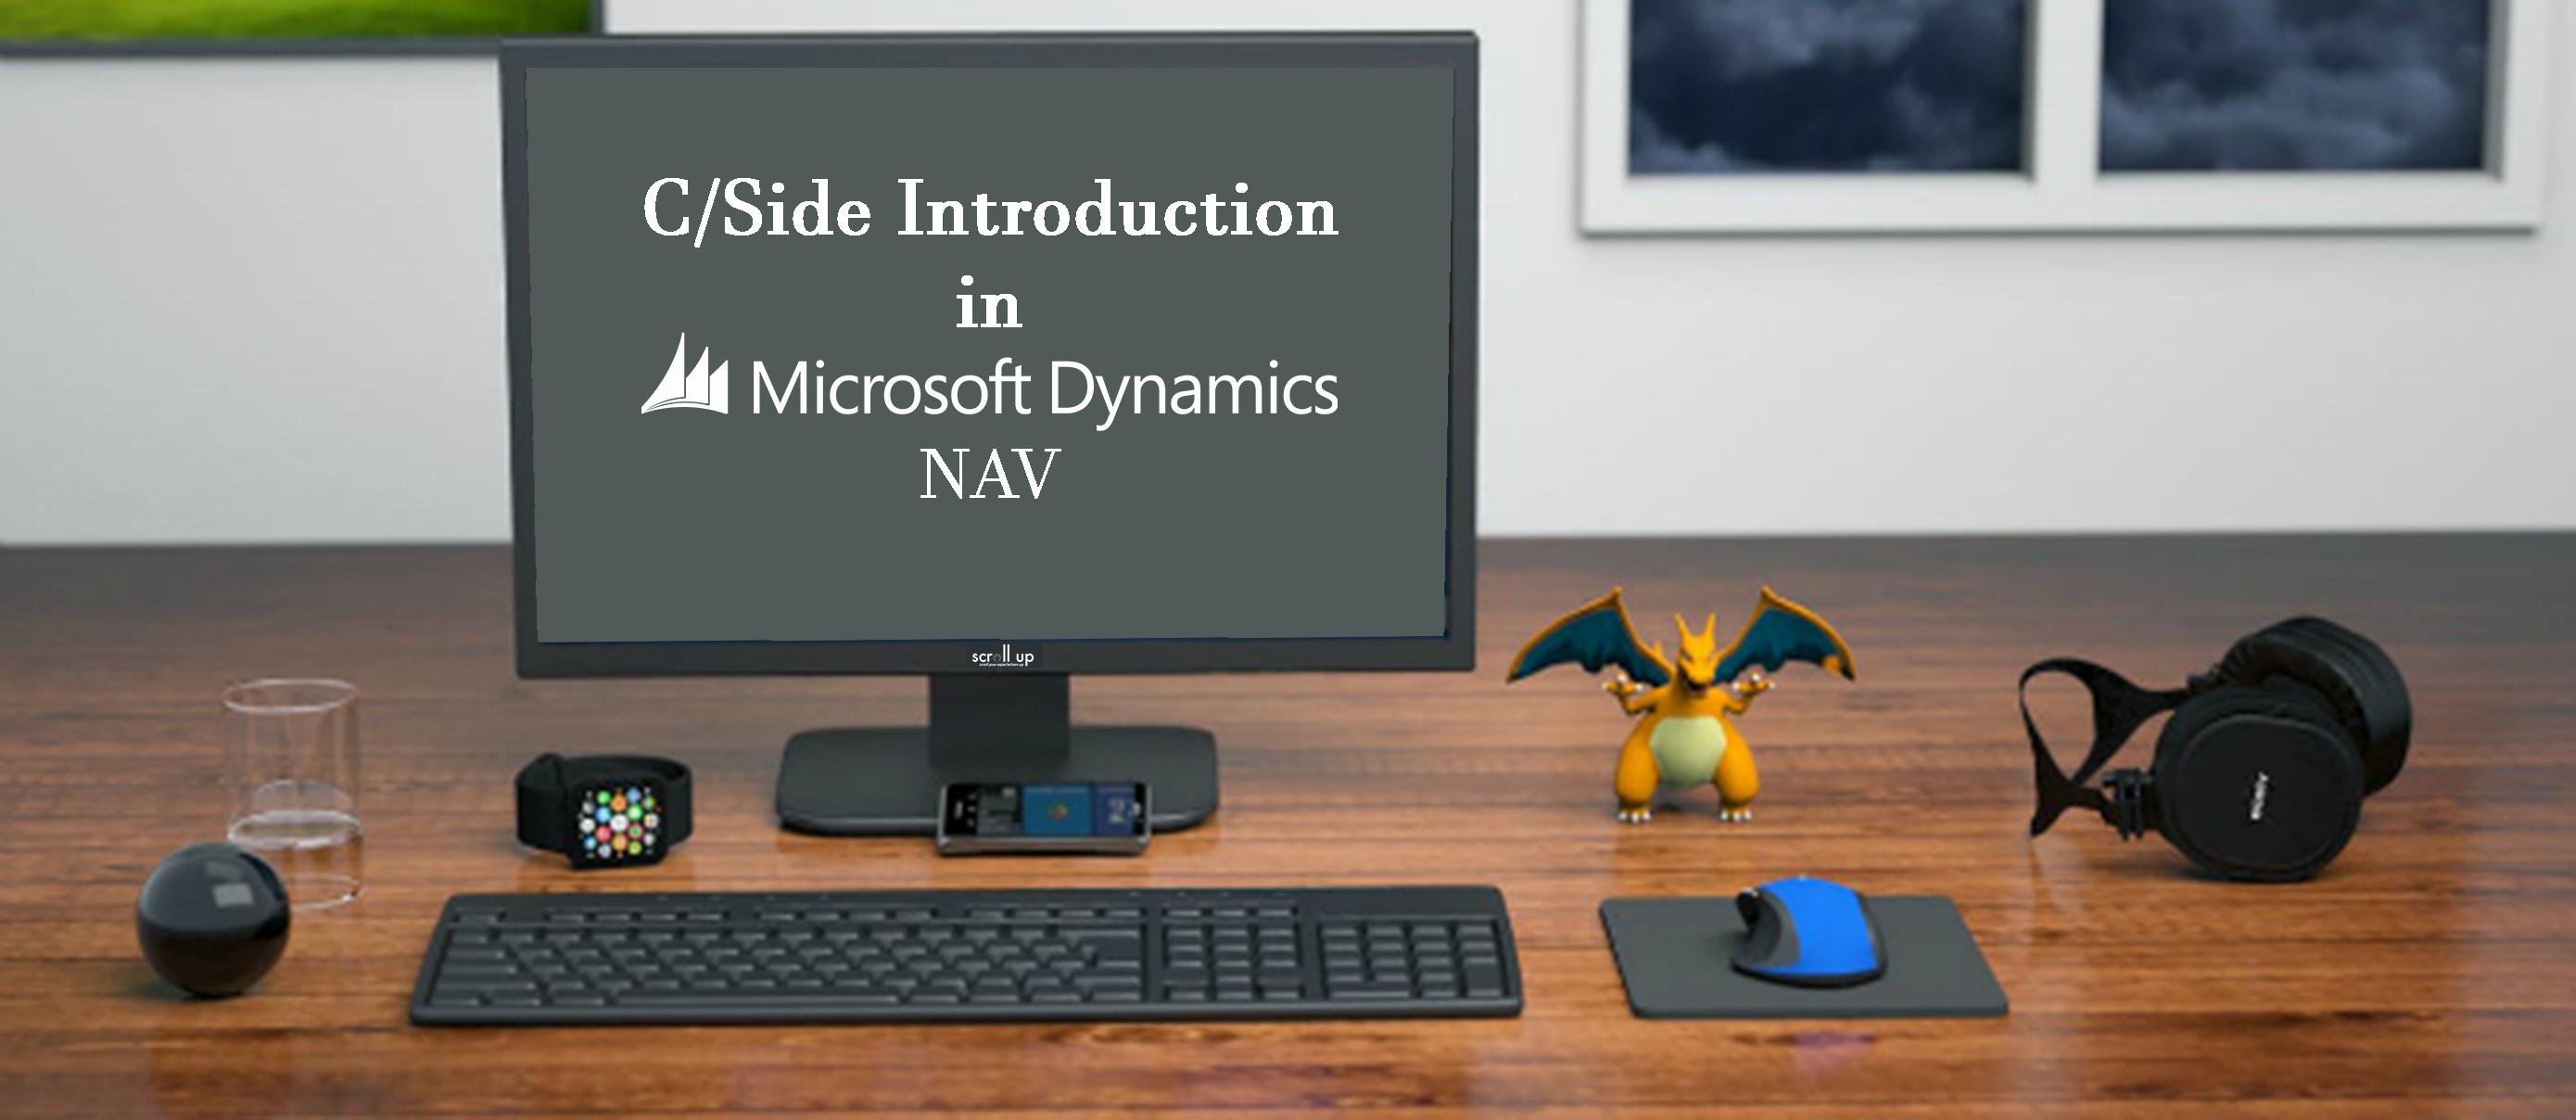 microsoft dynamics nav certification exam preparation guides